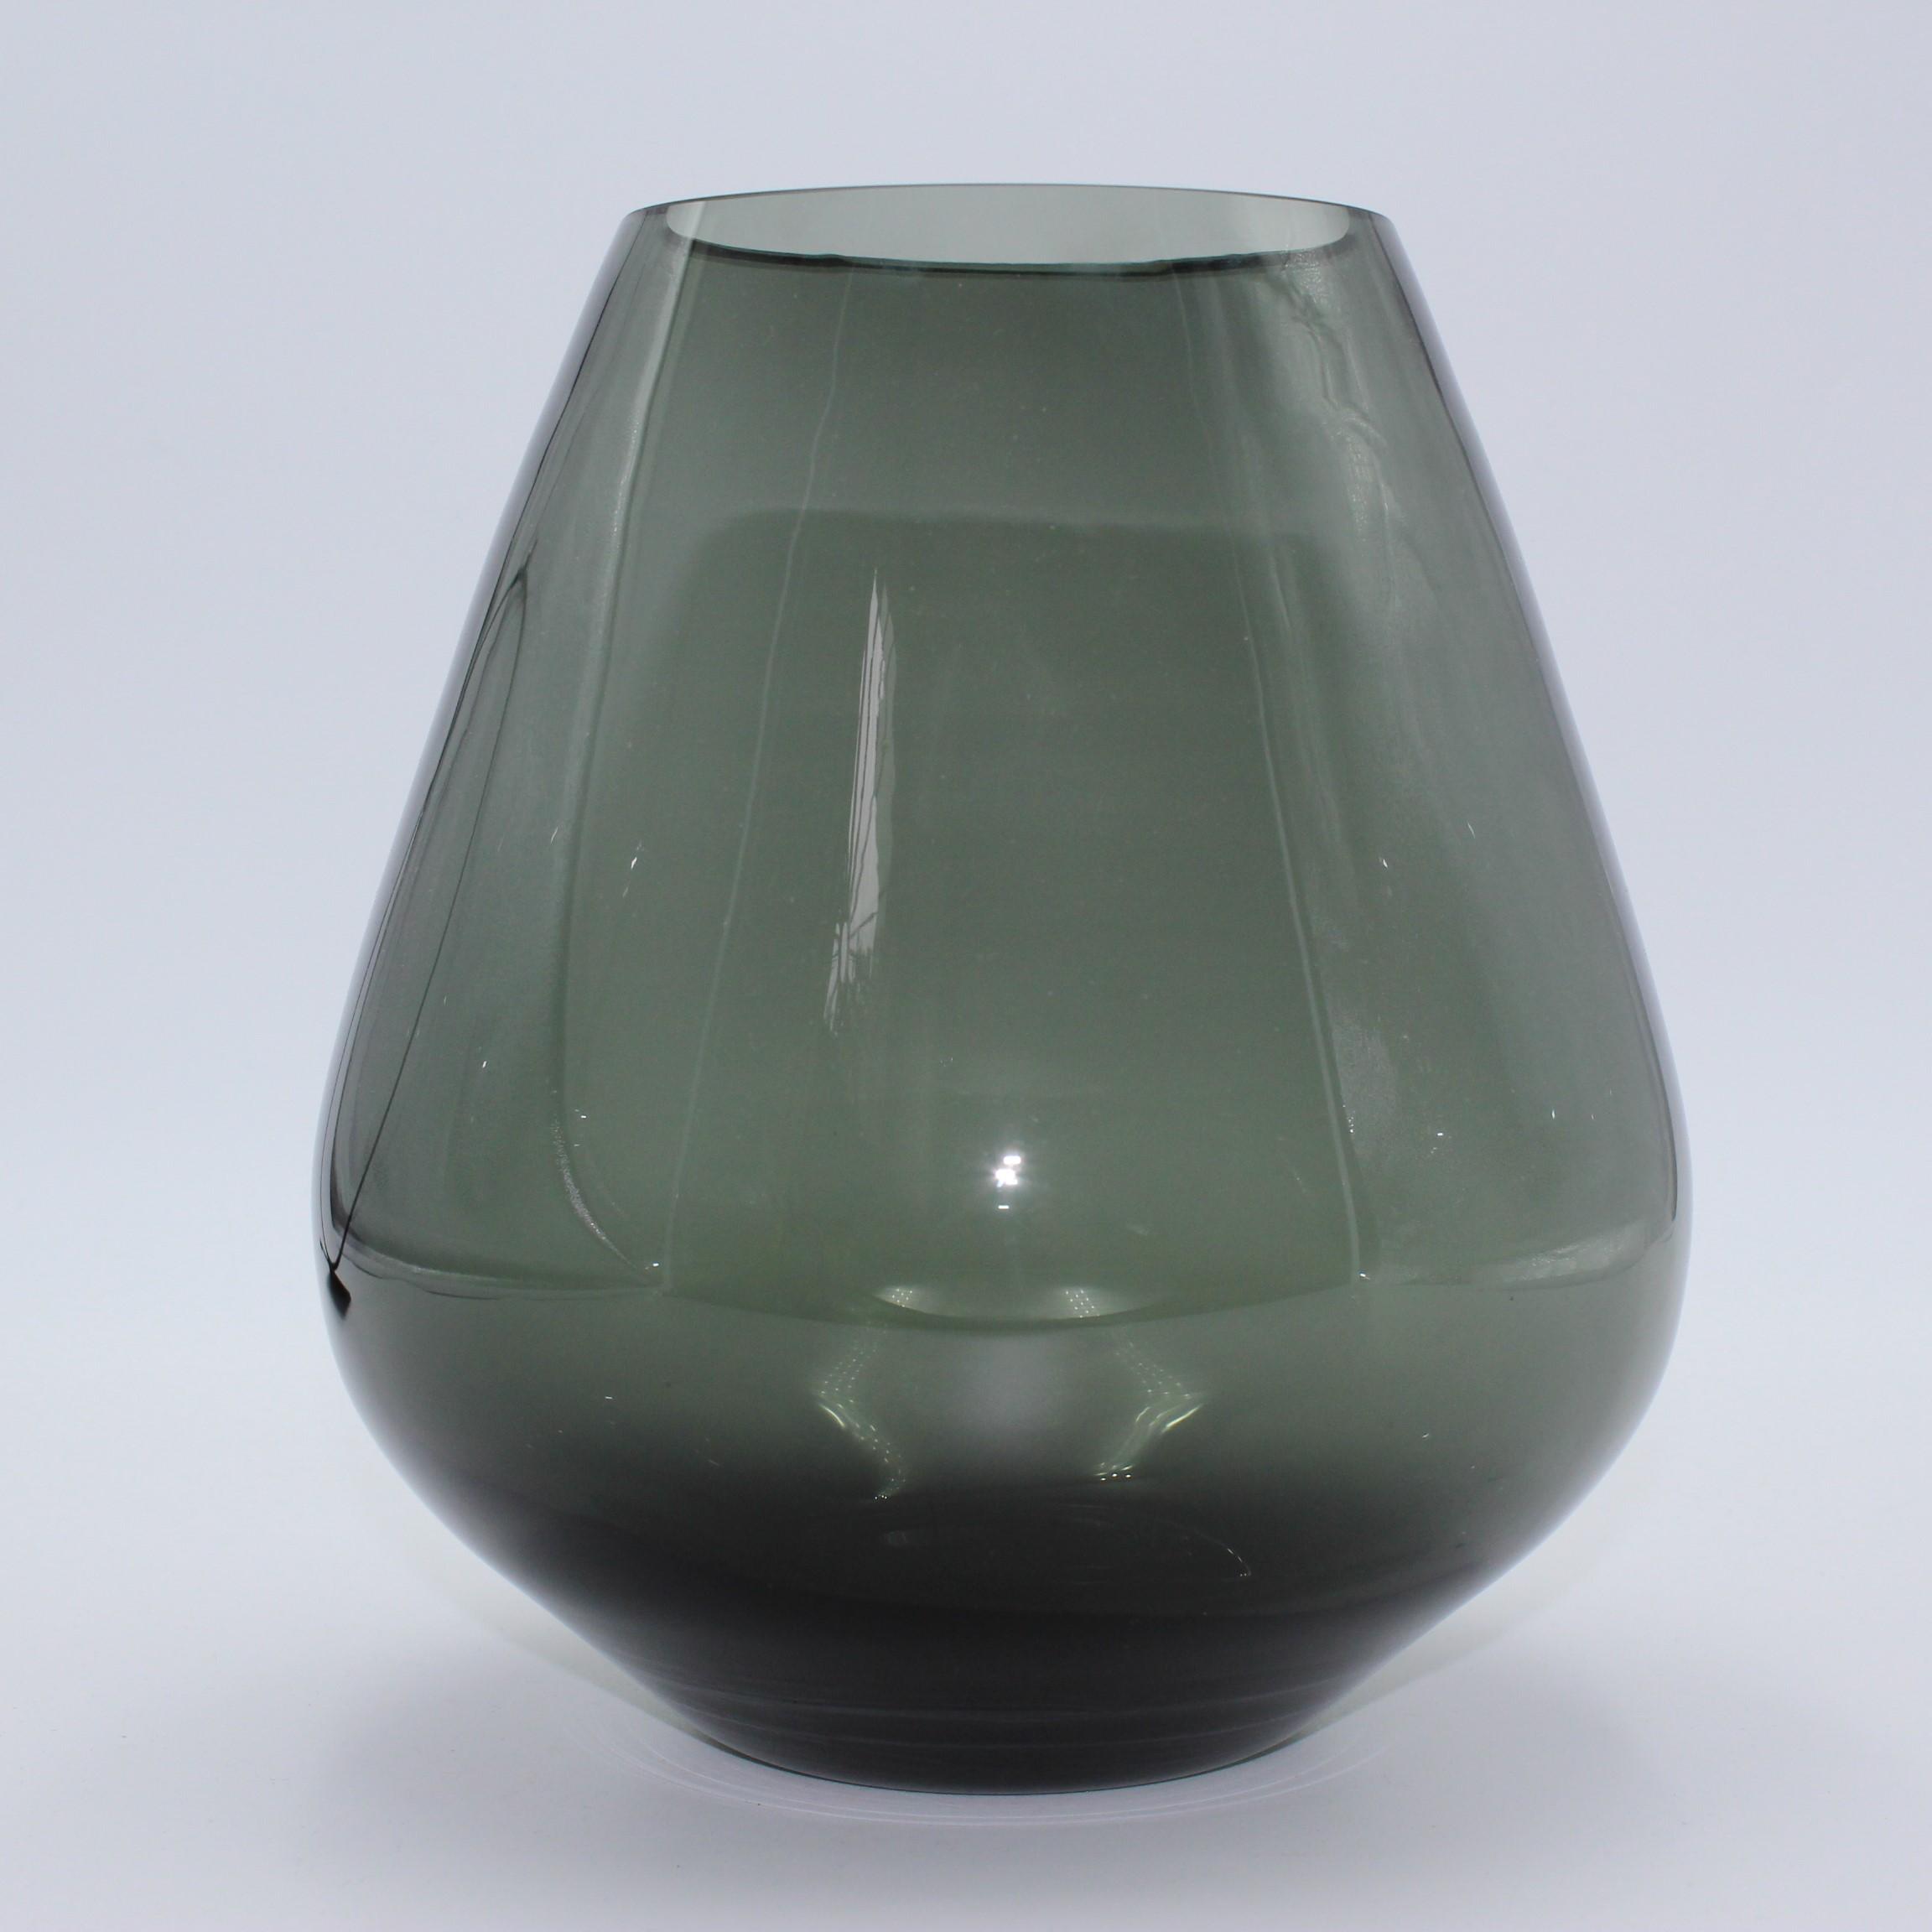 Edle Rauchglas Vase